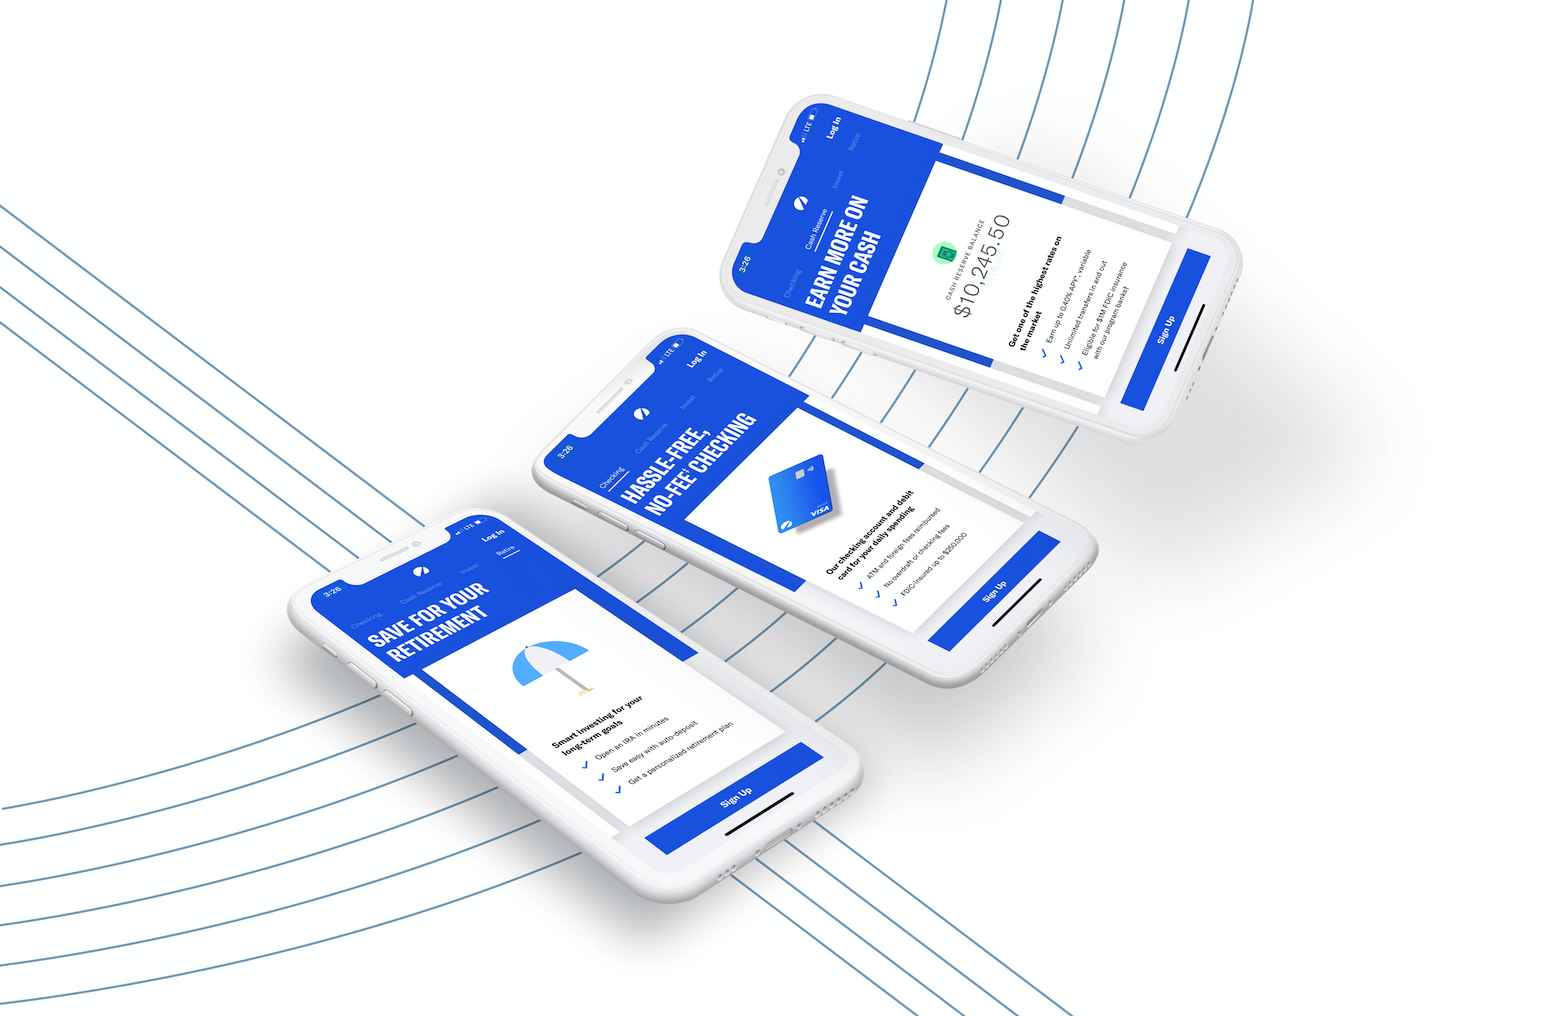 Betterment Mobile Money Management